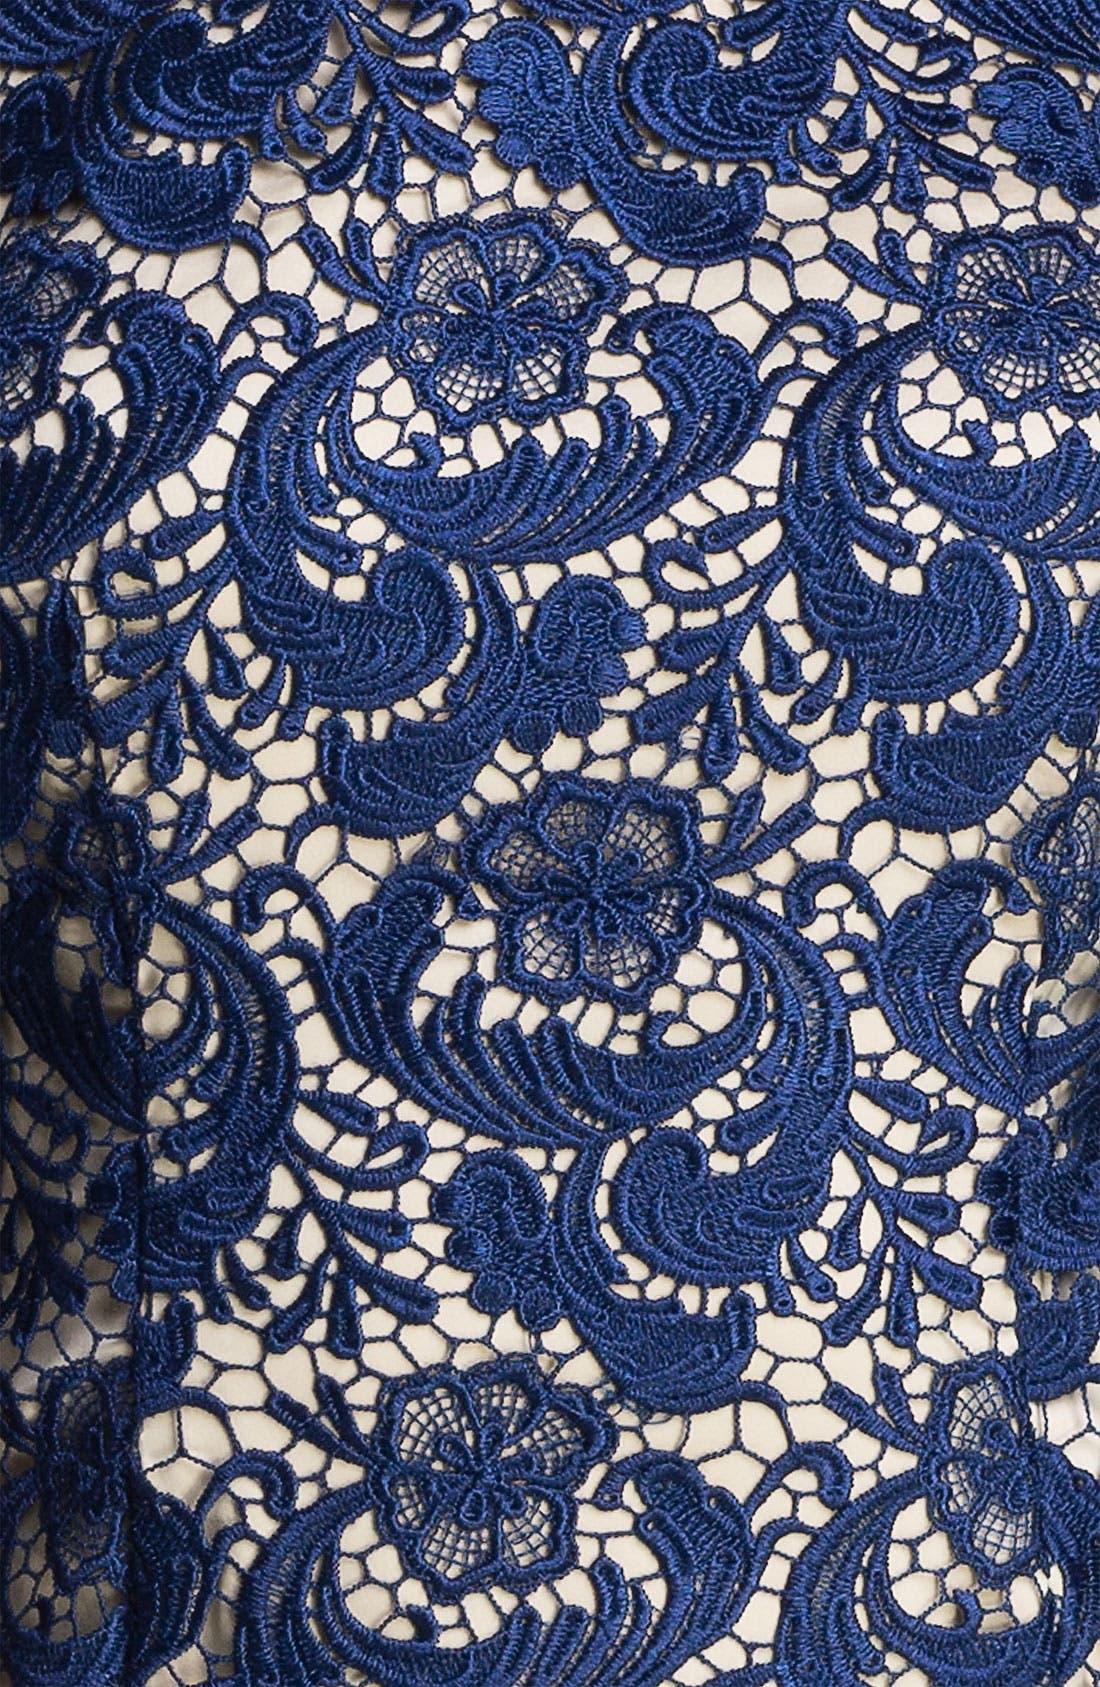 ELIZA J,                             Embroidered Lace Overlay Sheath Dress,                             Alternate thumbnail 5, color,                             410